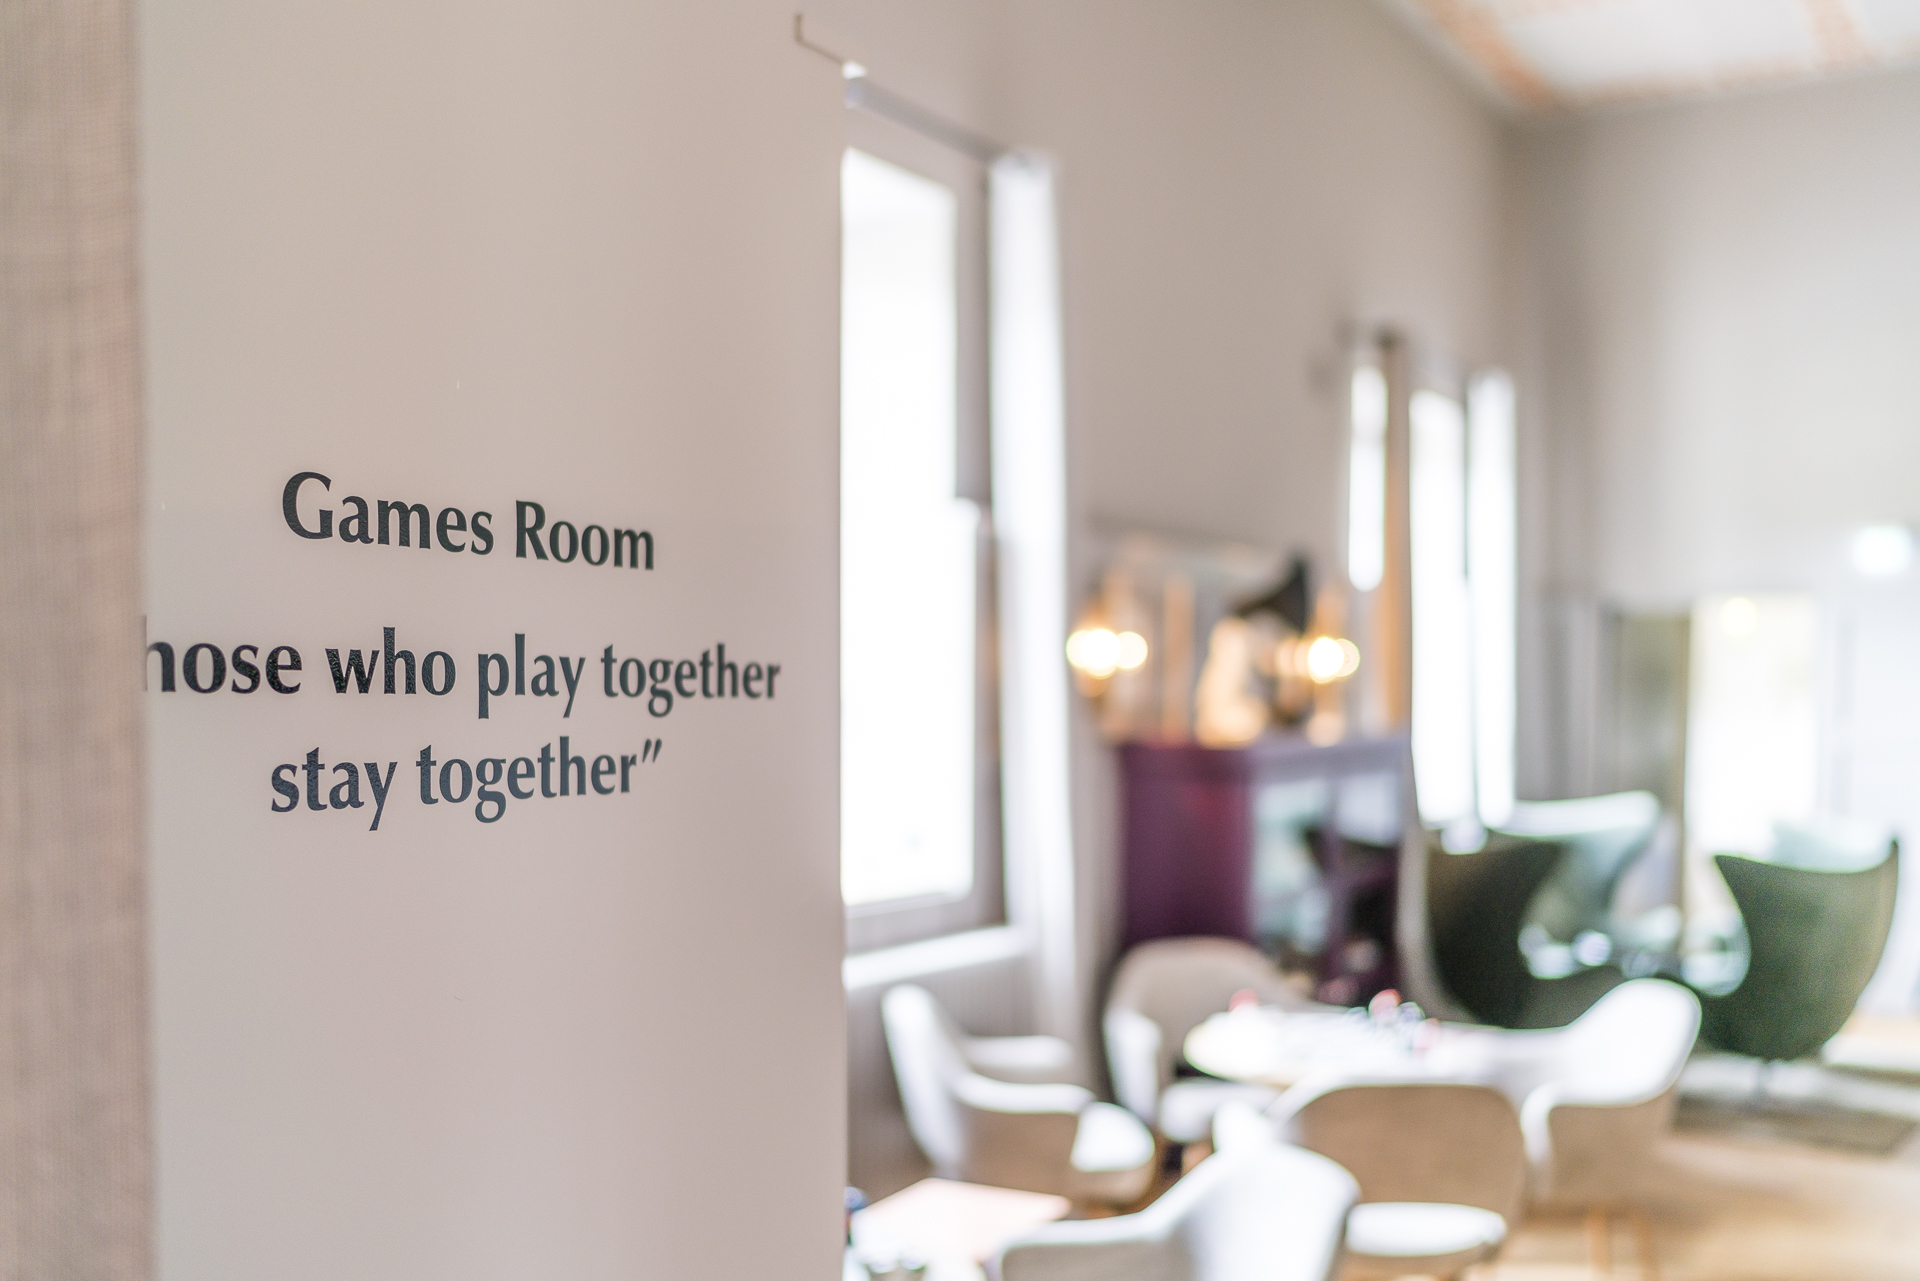 Games Room Kranzbach